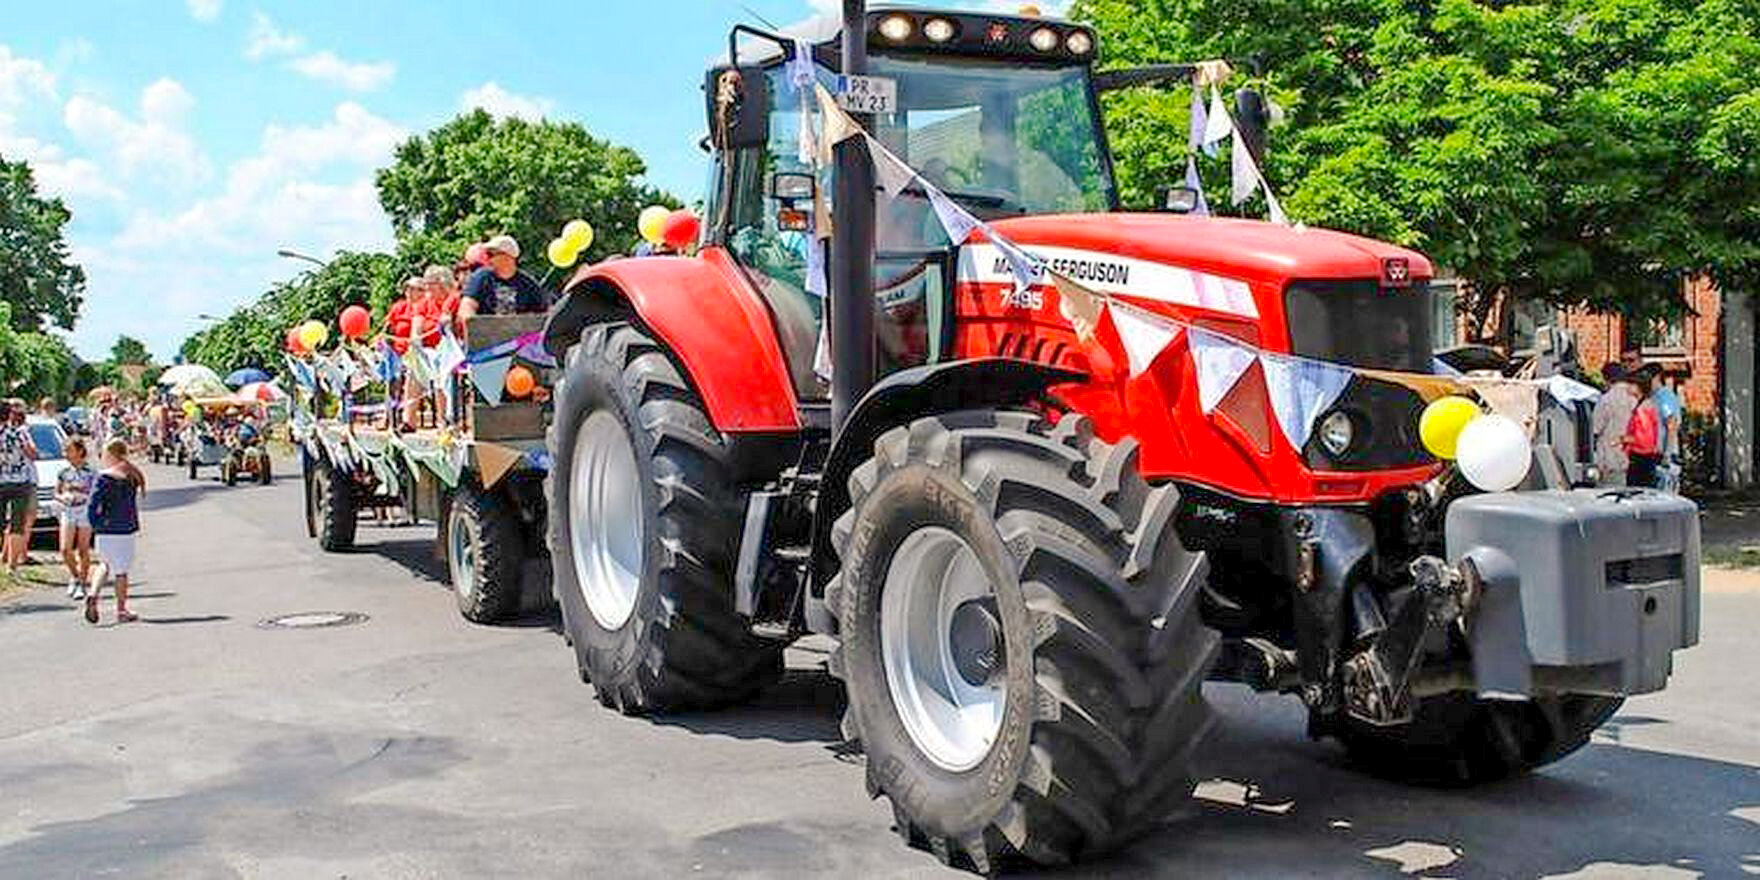 rMai-2018-Riesentraktor_beim_Festumzug